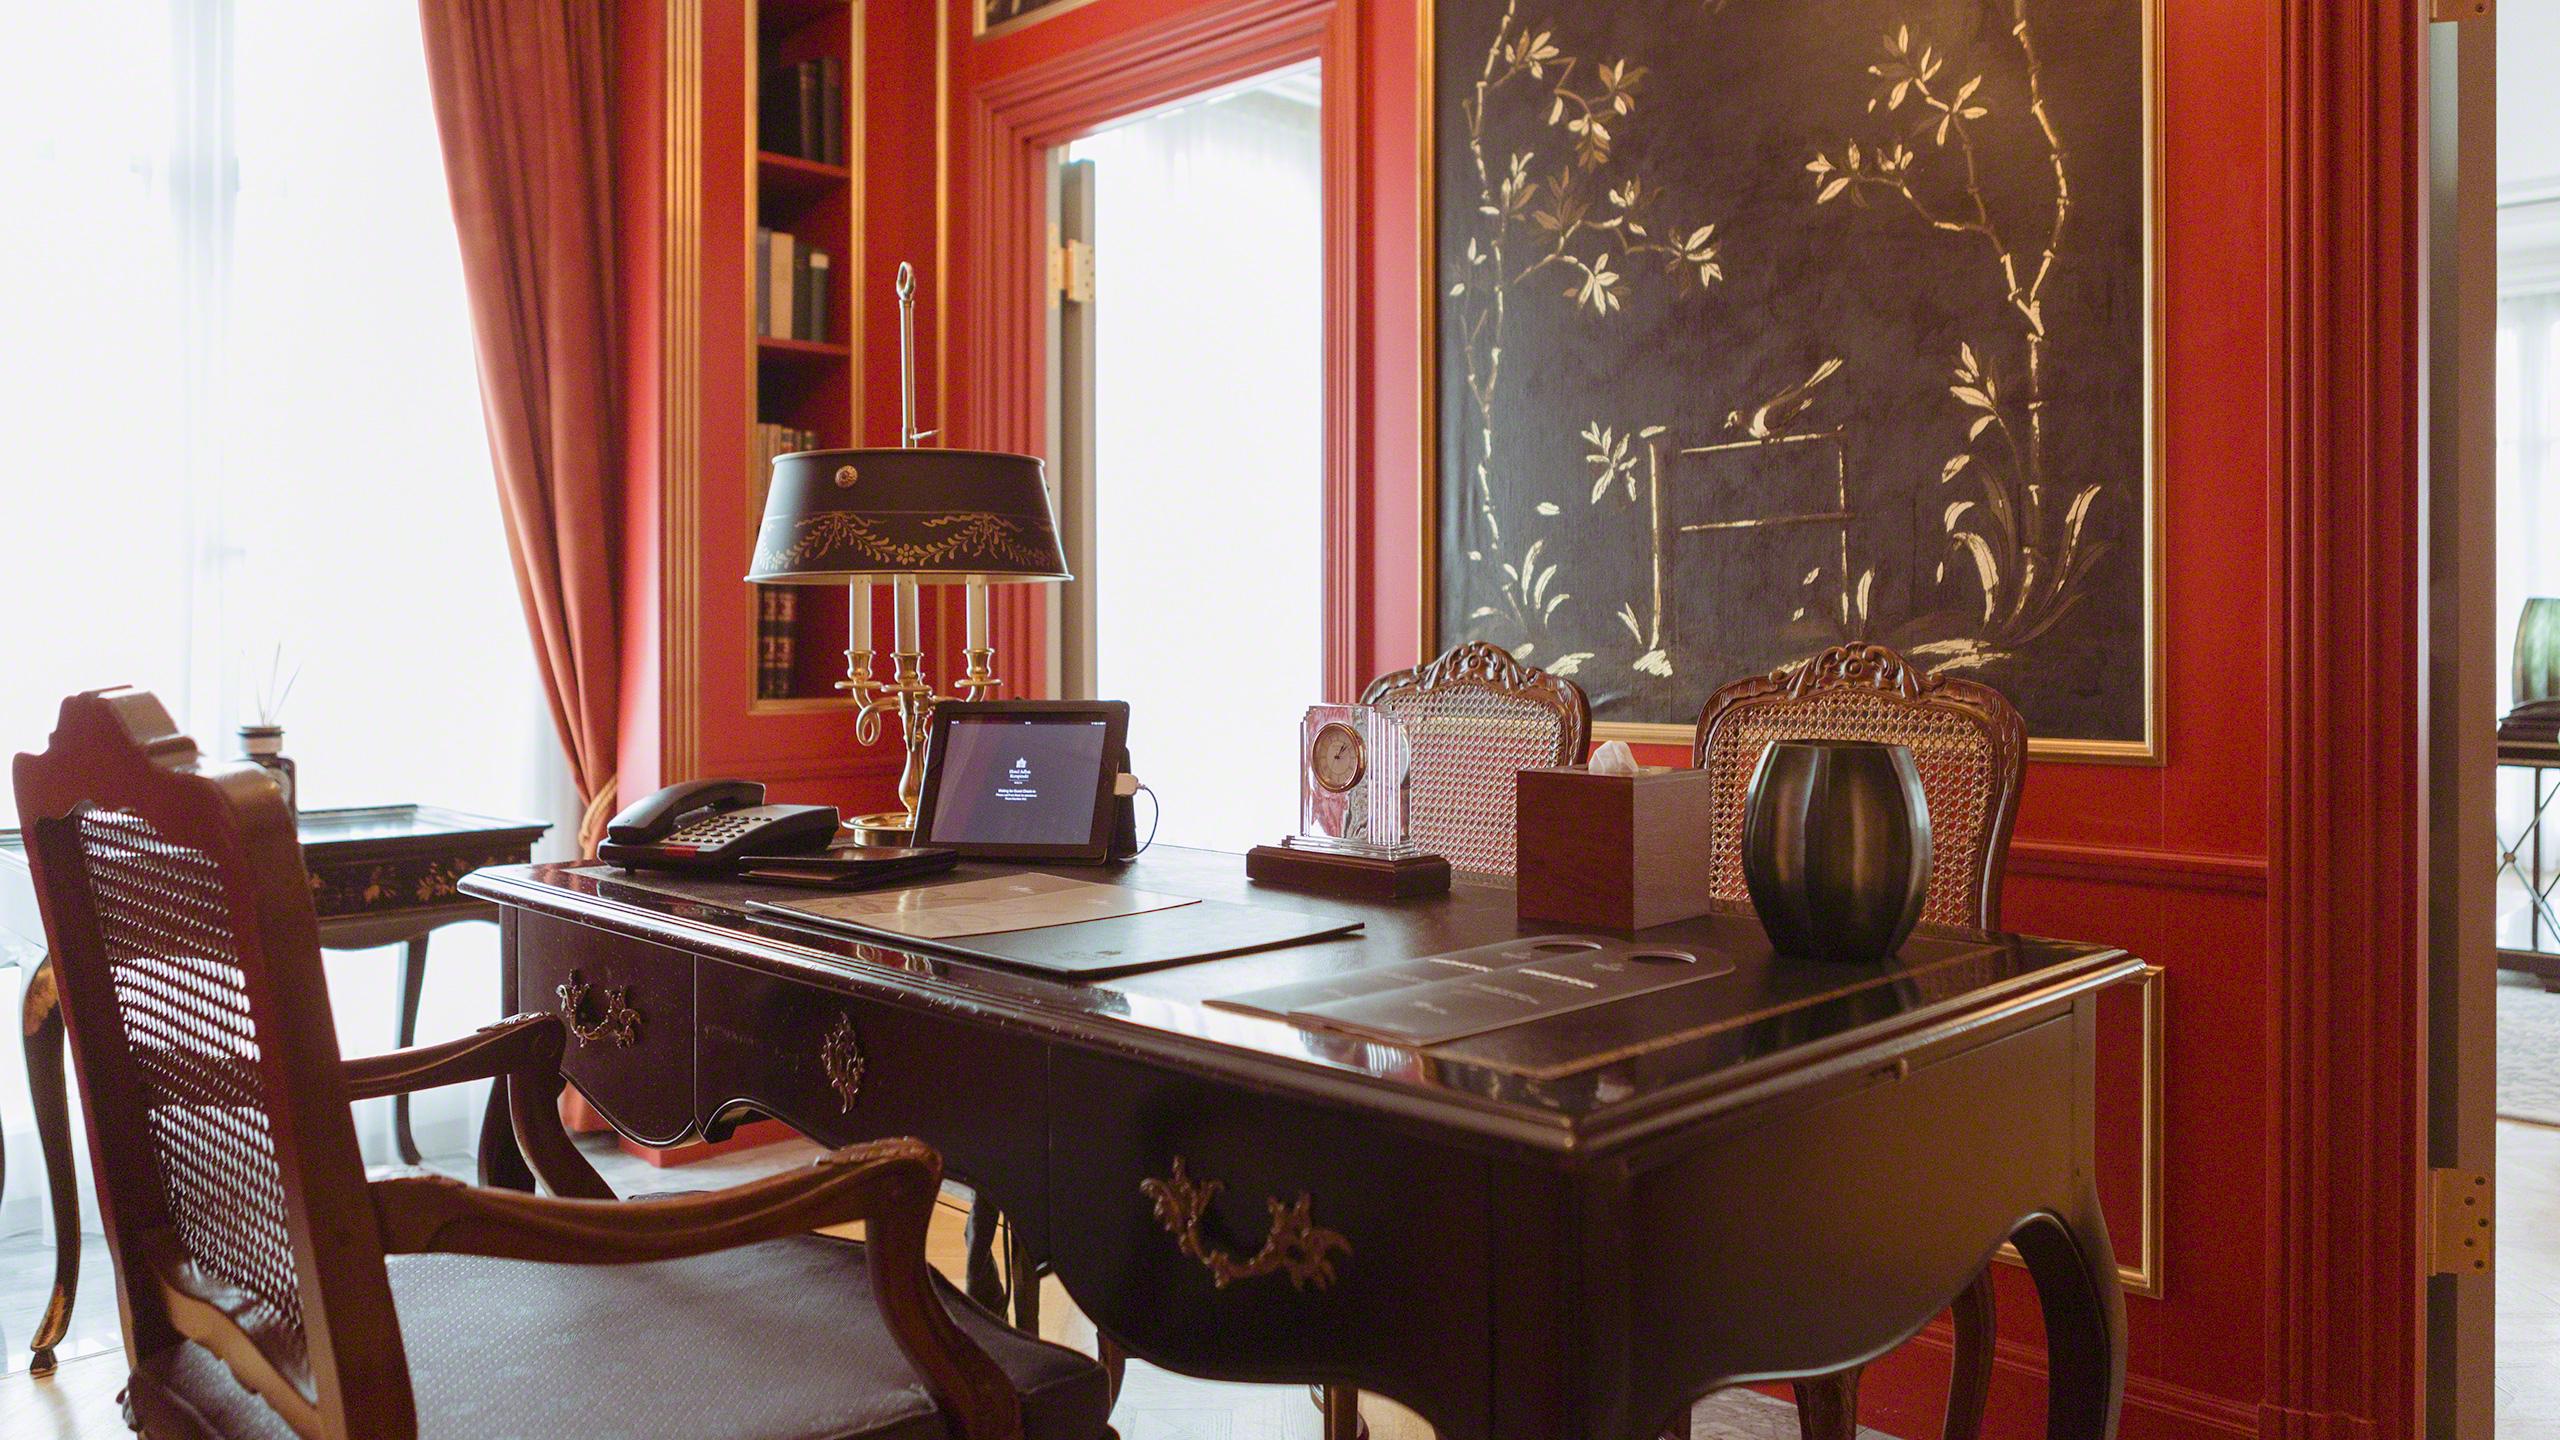 Luxushotel Adlon Kempinski Berlin Royal Suite Arbeitszimmer